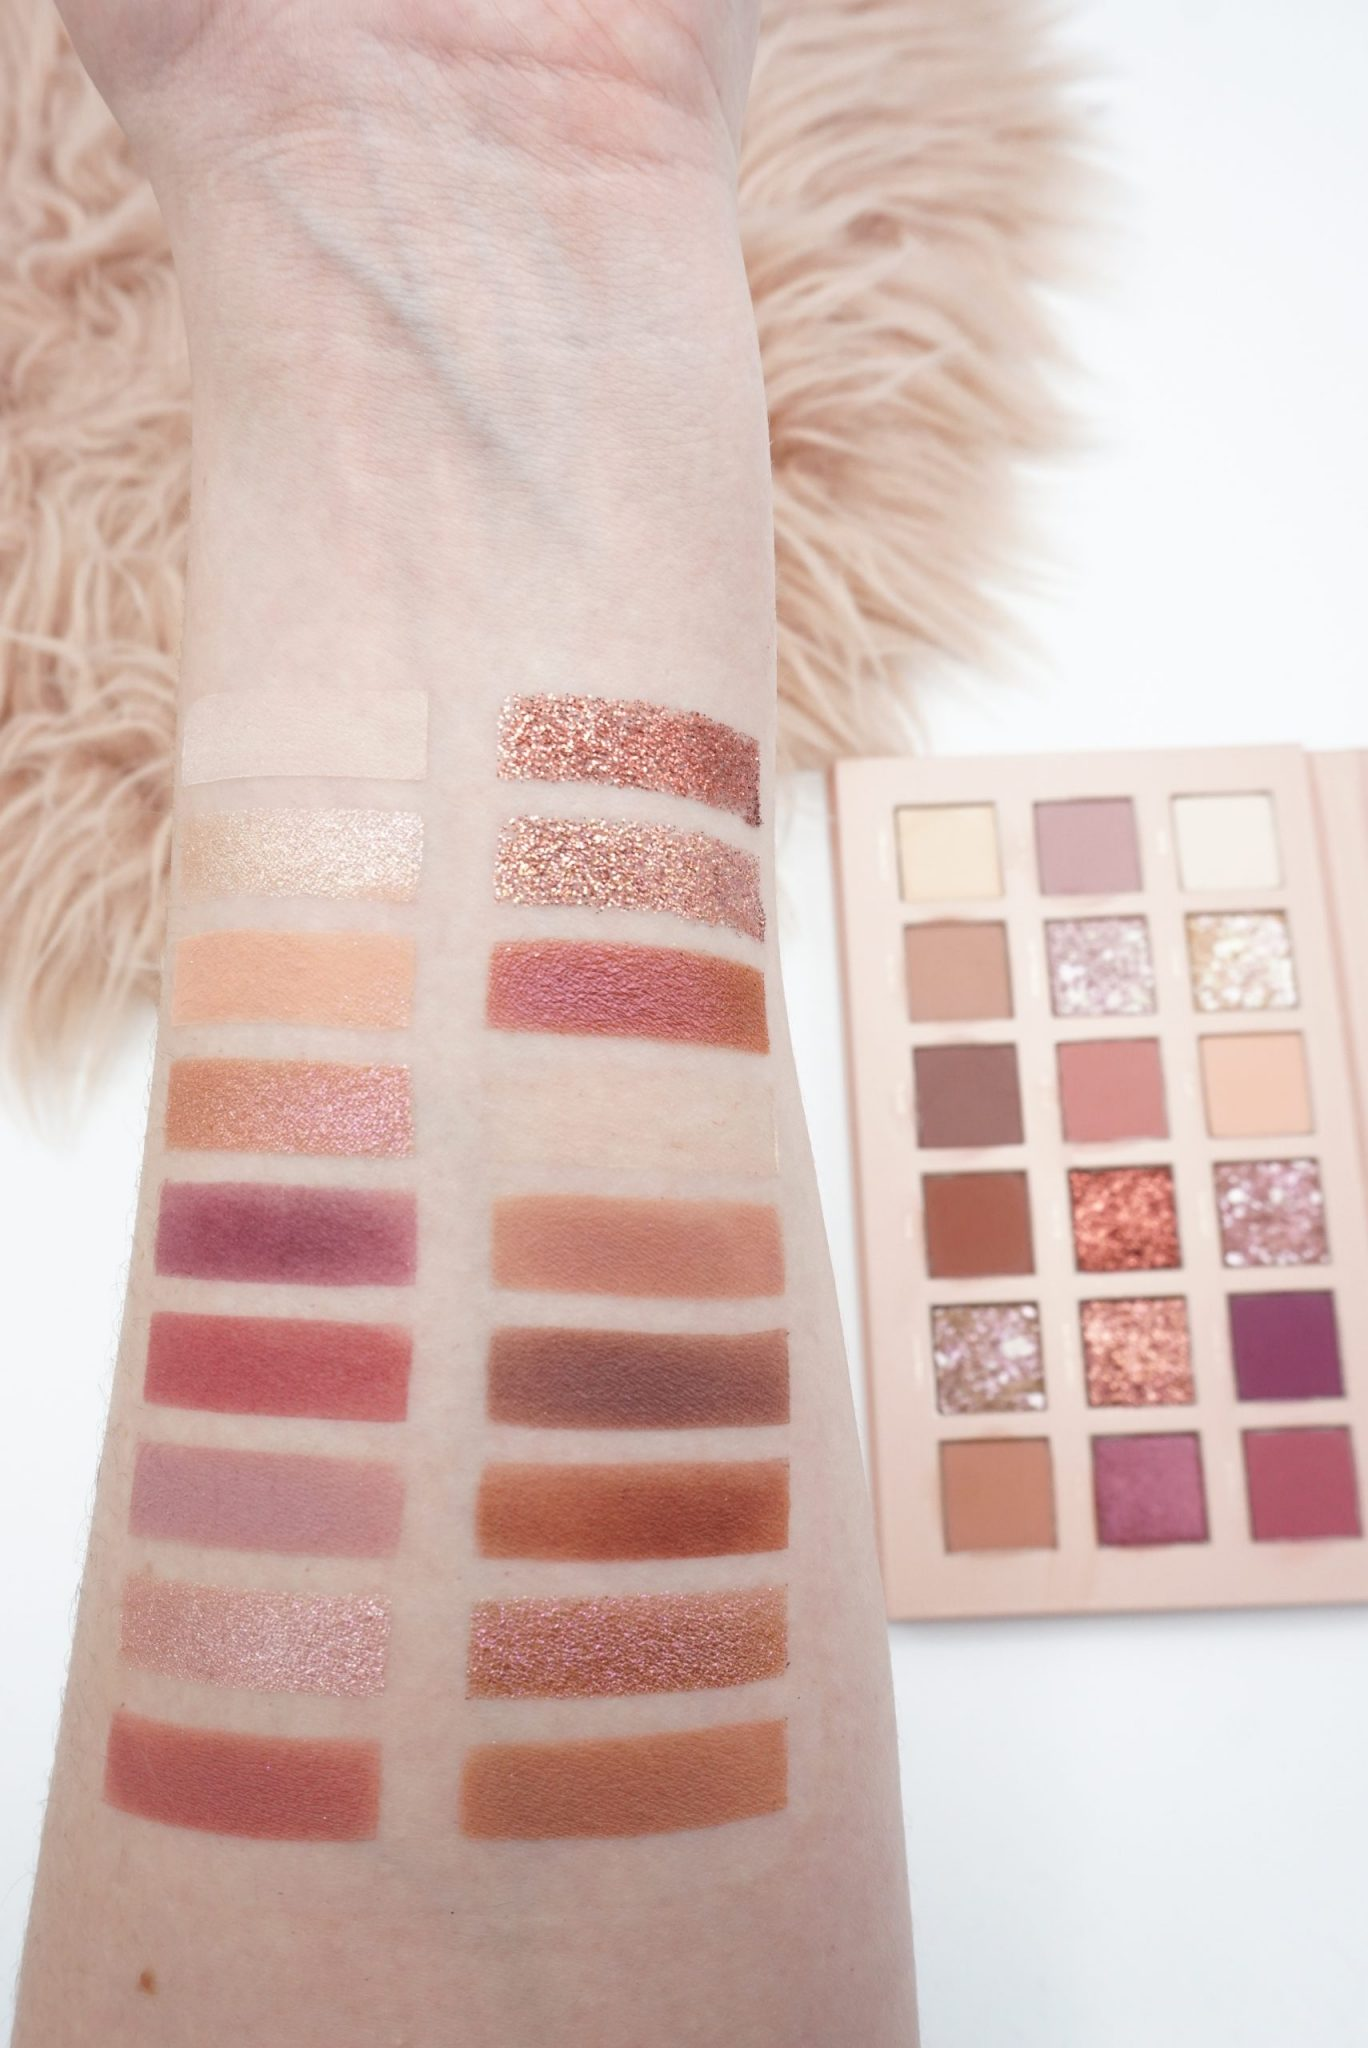 Aesthetically Pleasing Huda Beauty New Nude Palette Review ⋆ Beautymone